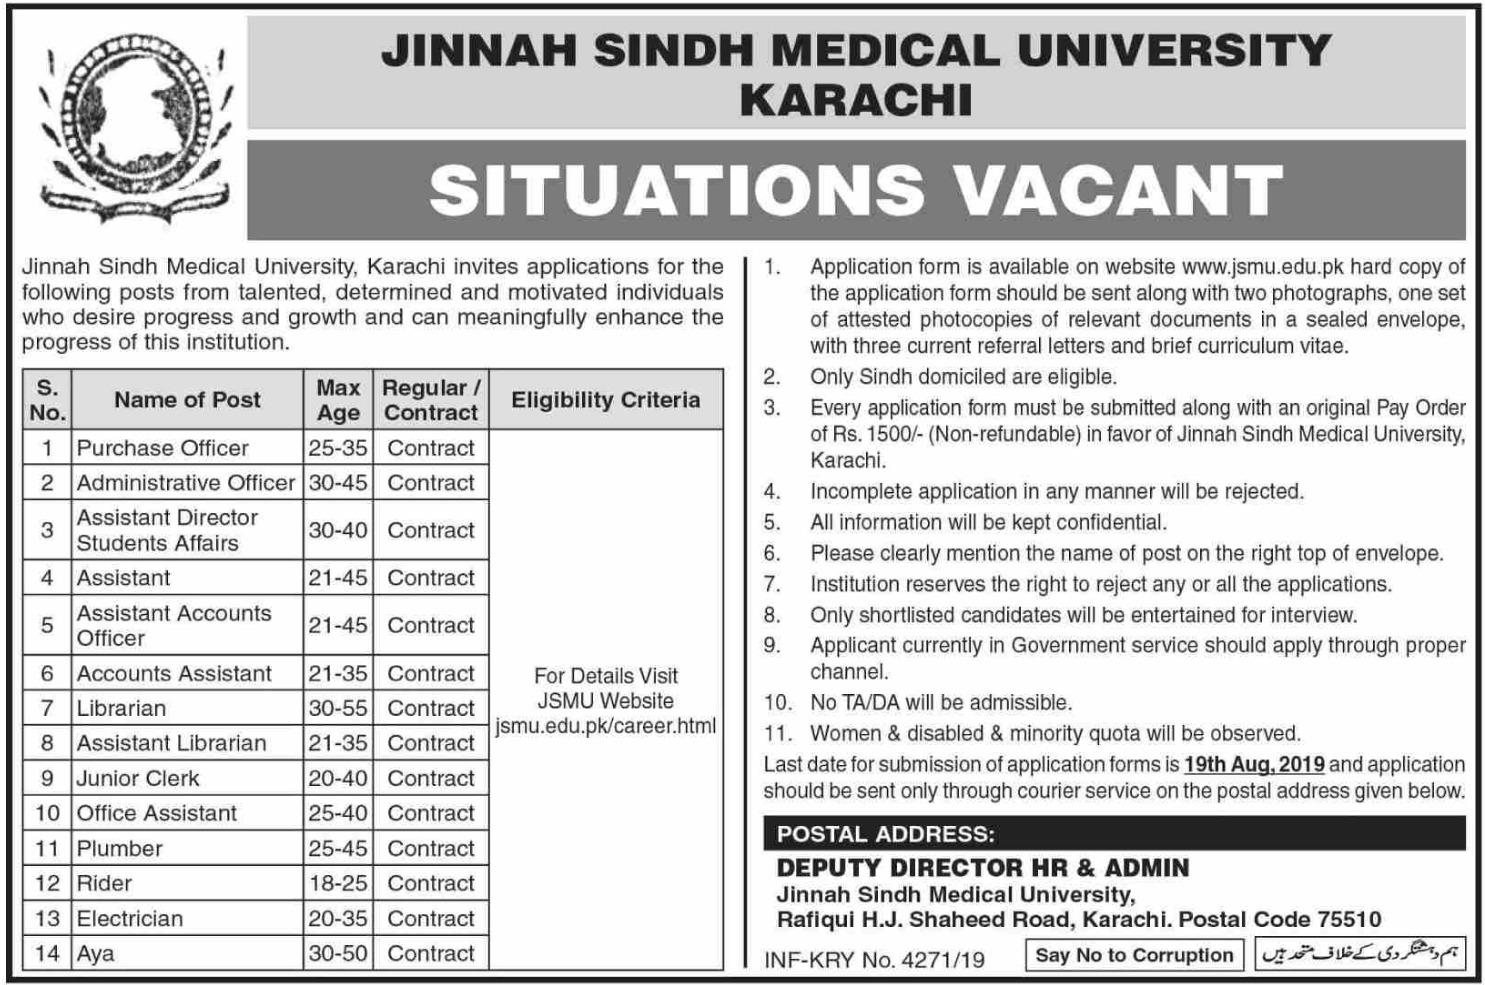 Jinnah Sindh Medical University JSMU Karachi Jobs 2019 Latest